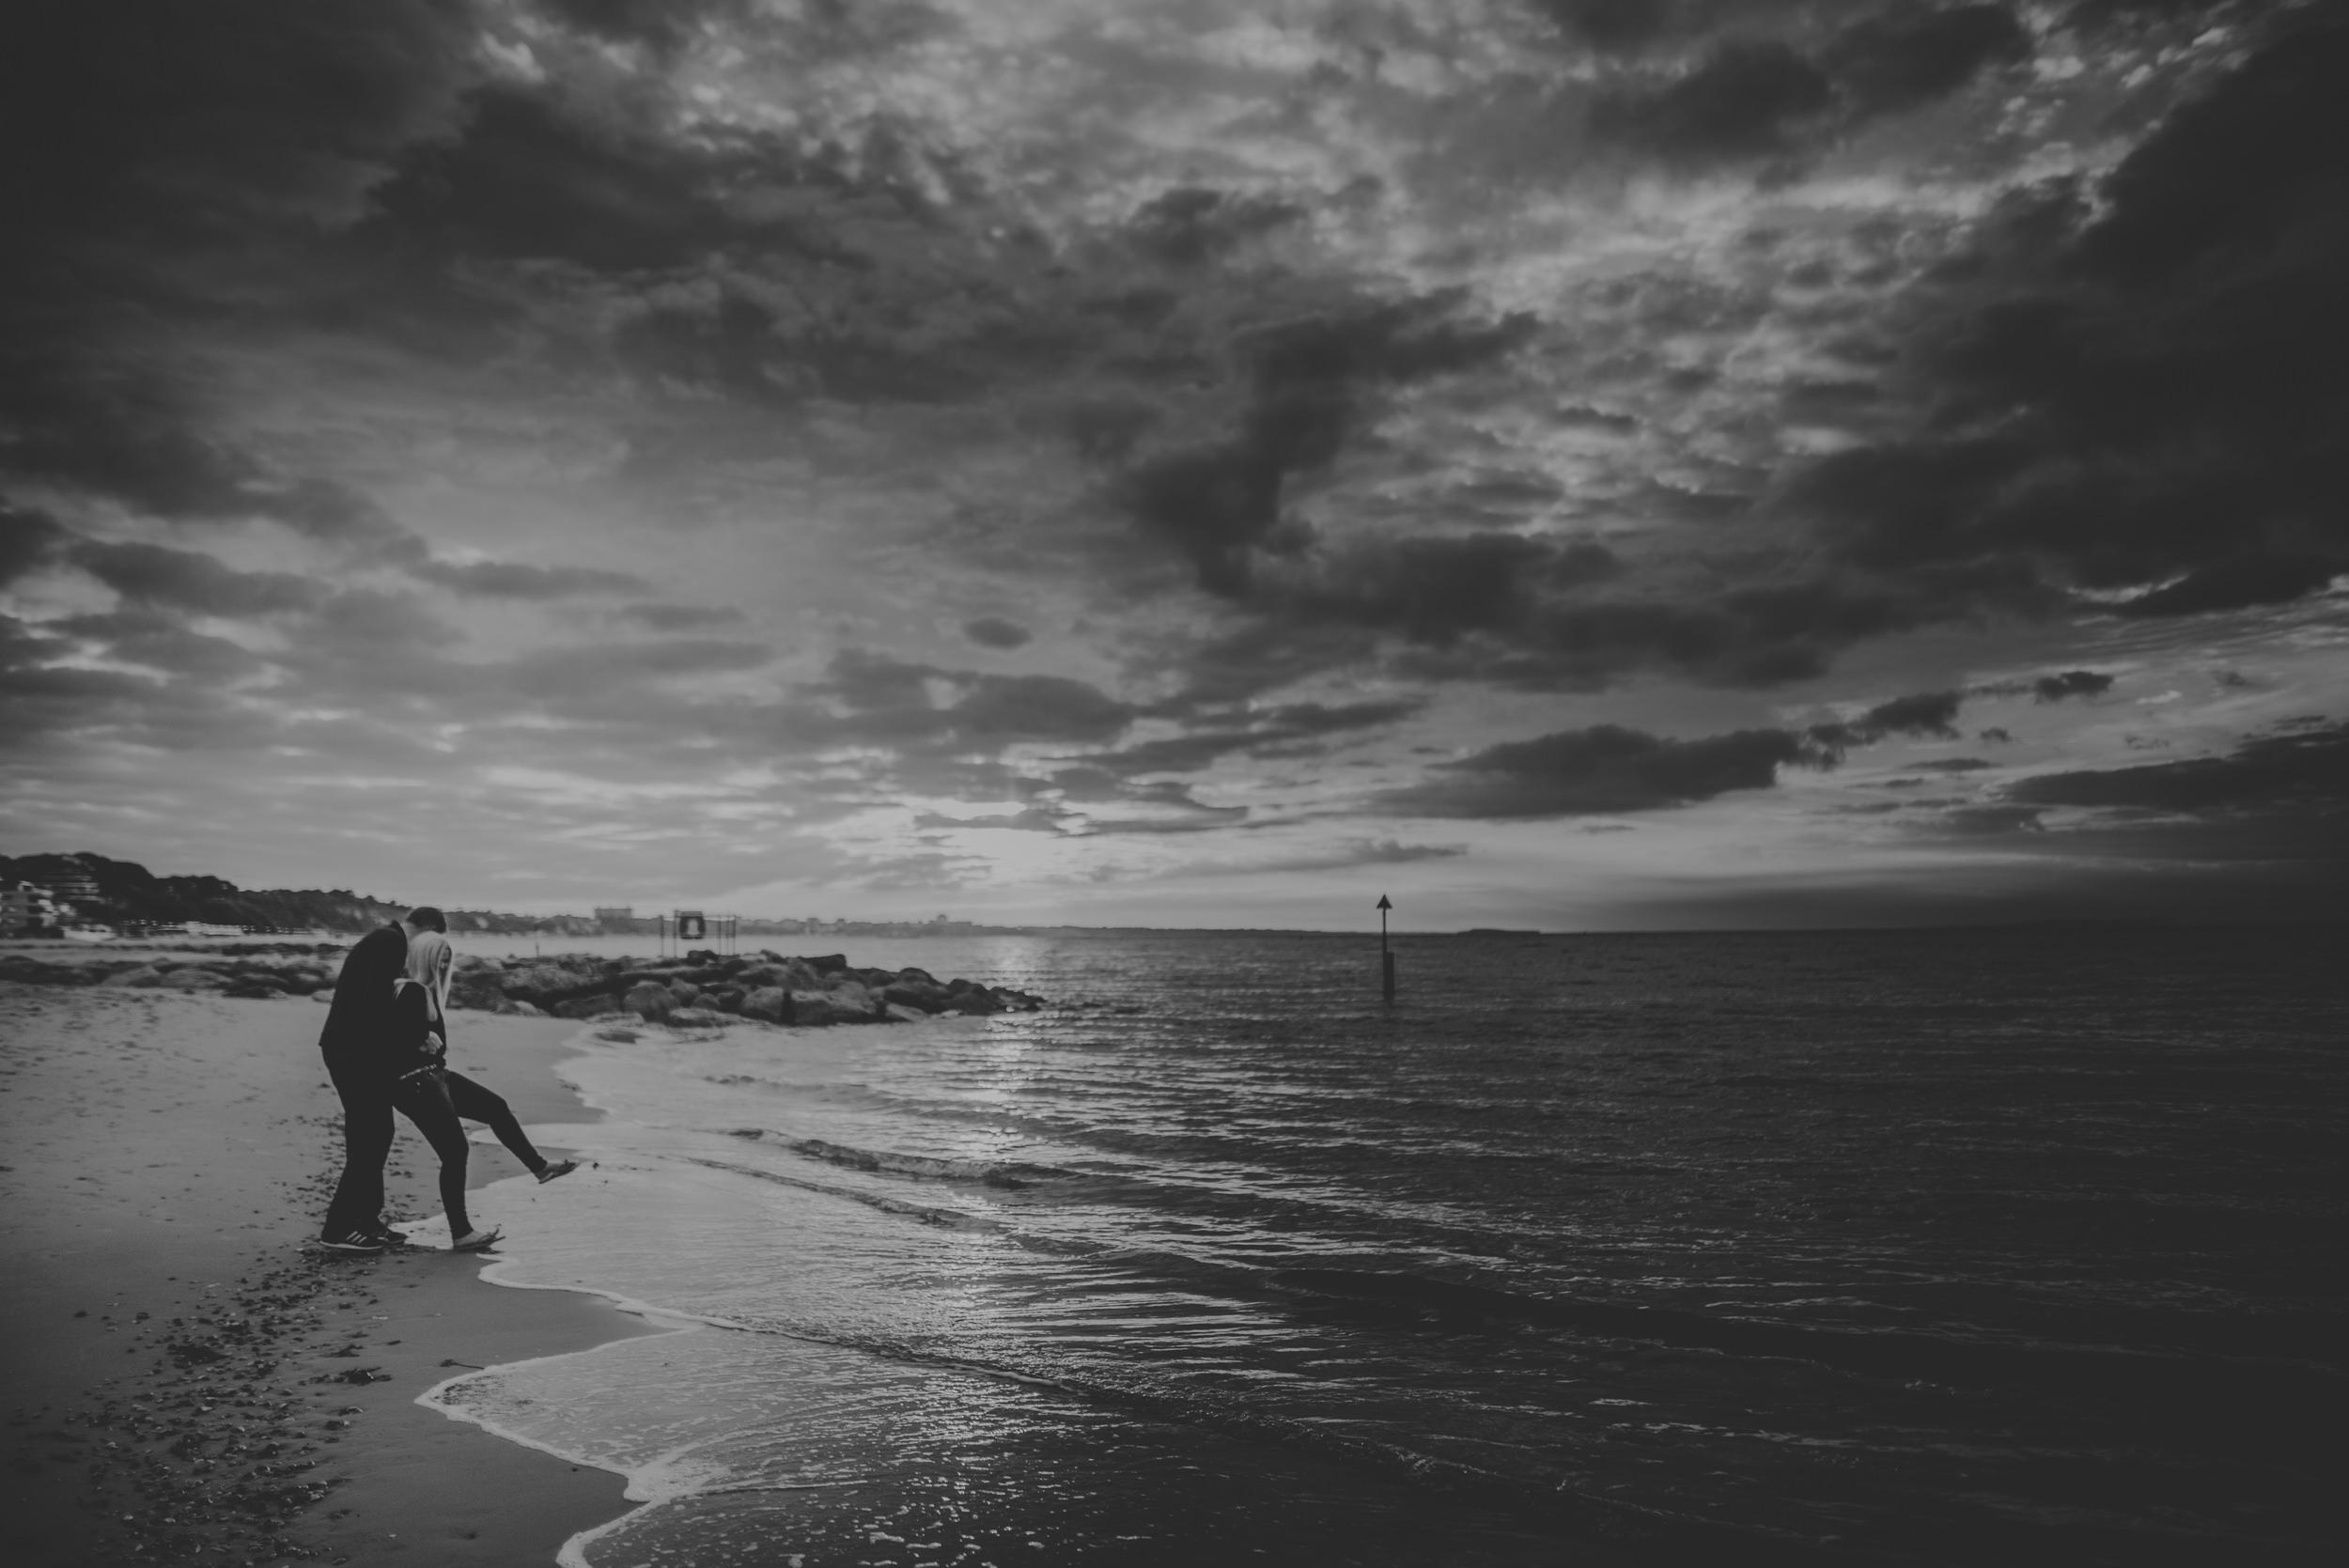 Trisha-and-Robert-Engagement-session-Sandbanks-beach-Poole-Manu-Mendoza-Wedding-Photography-036.jpg